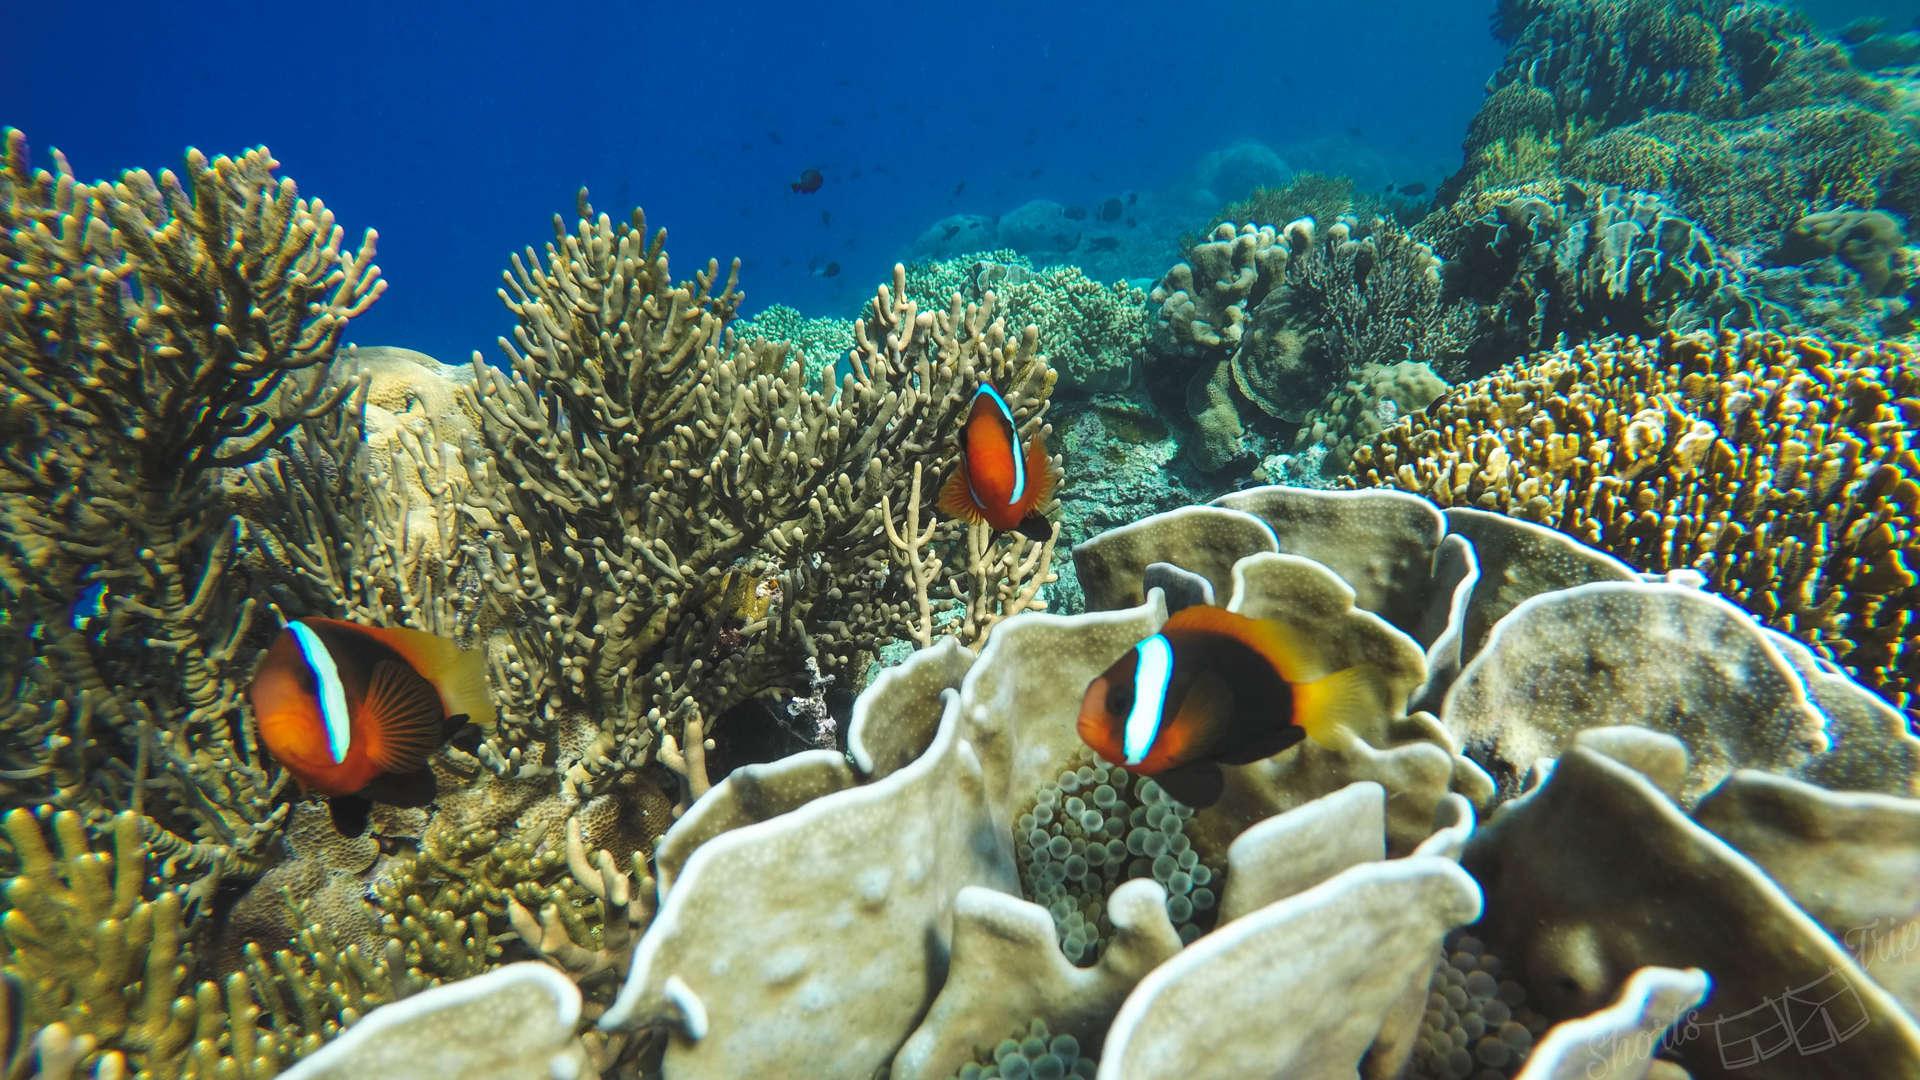 nemo, looking for nemo, banda islands, pulau hatta, hatta island, snorkeling at hatta, snorkelling at hata, hatta snorkeling, best snorkel indonesia, top snorkeling indonesia